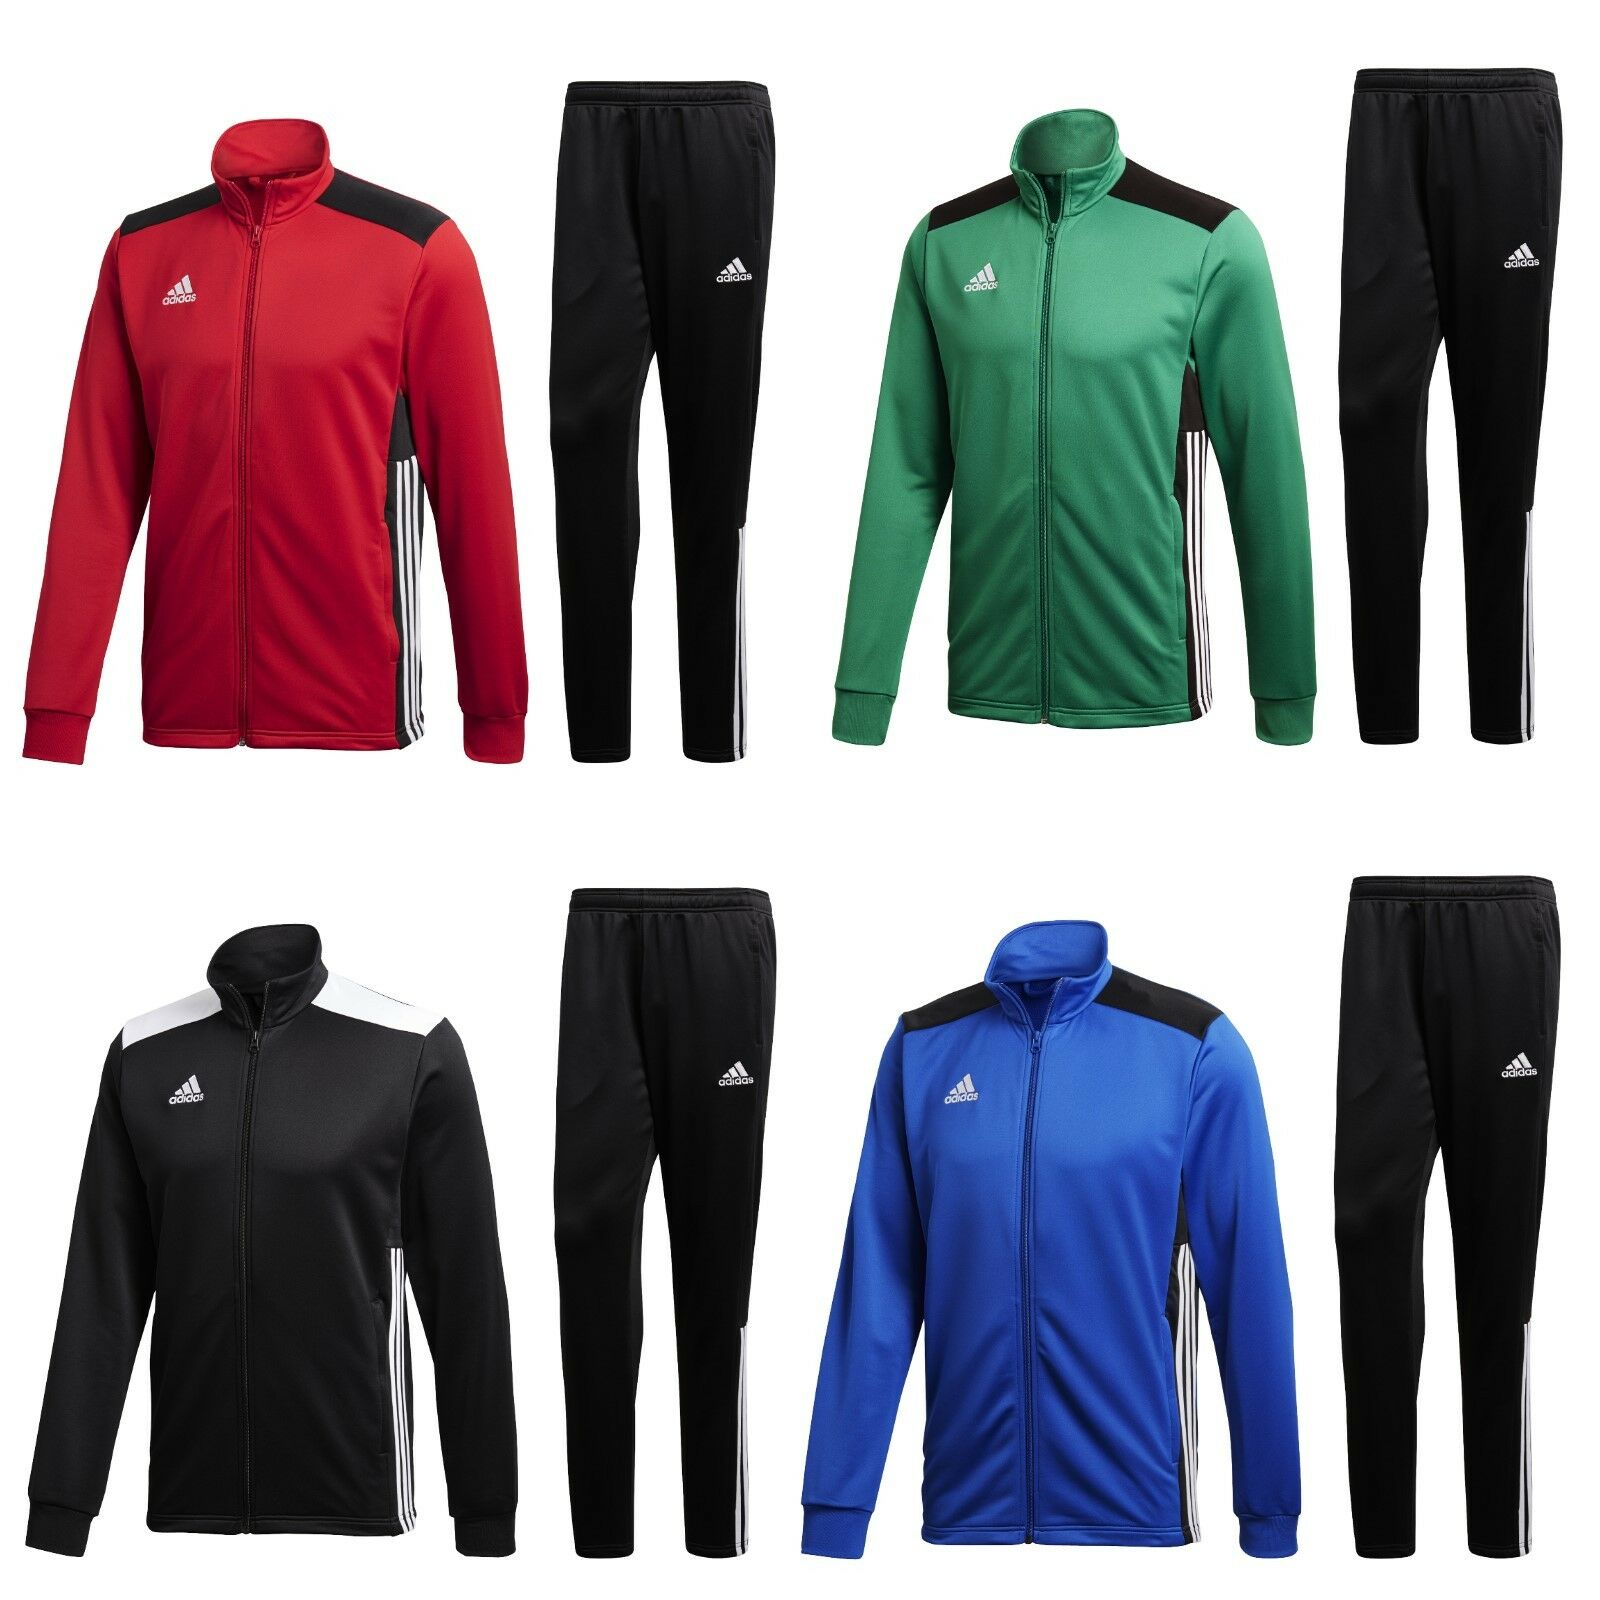 adidas Trainingsanzug Männer Herren Sportanzug Jogginganzug schwarz grün roter